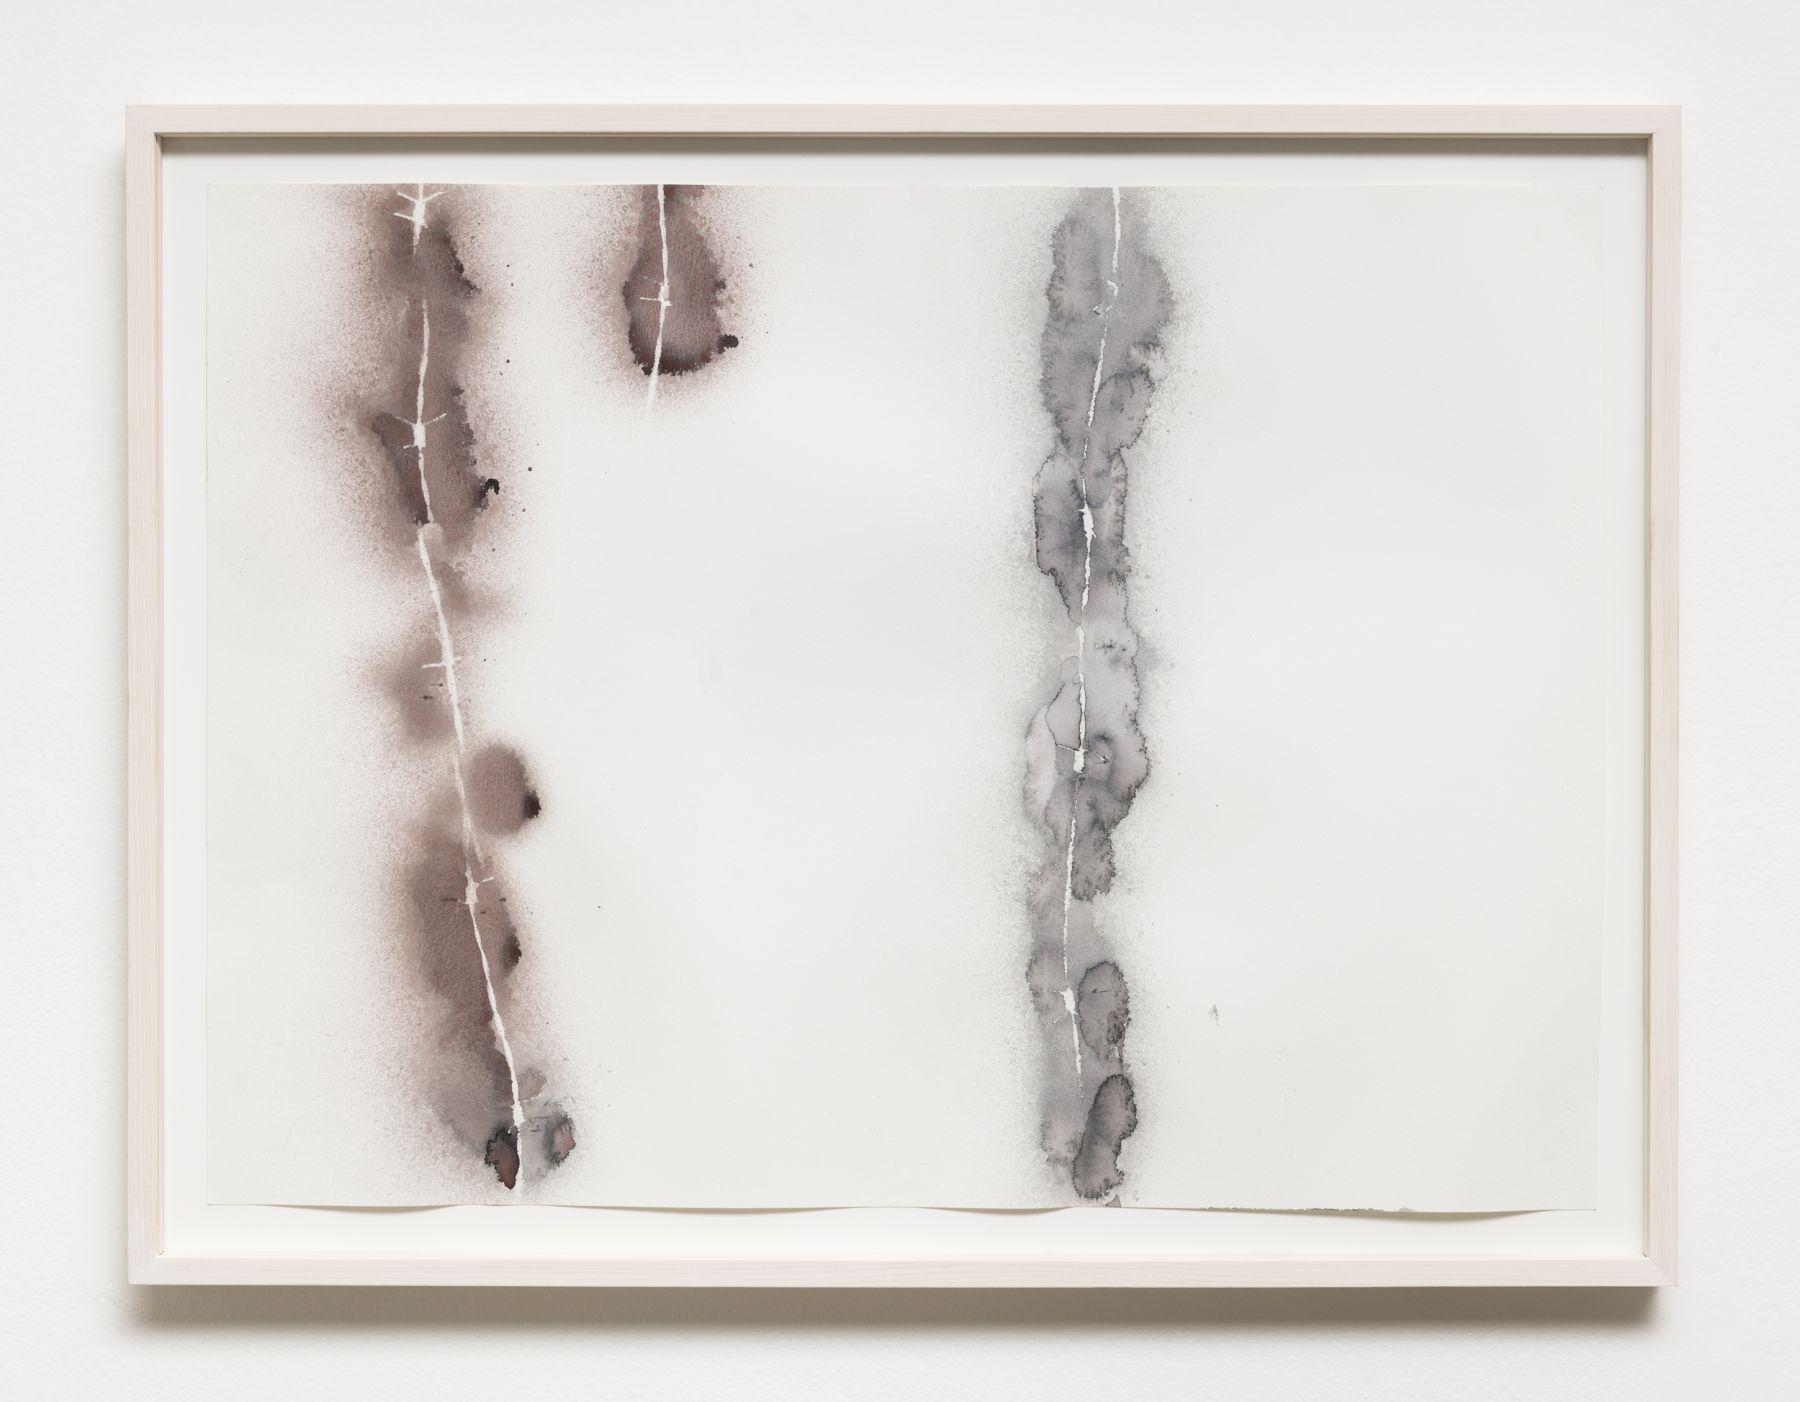 Melvin Edwards, Variações de correntes em cor (Chain Variations in Color), 2019